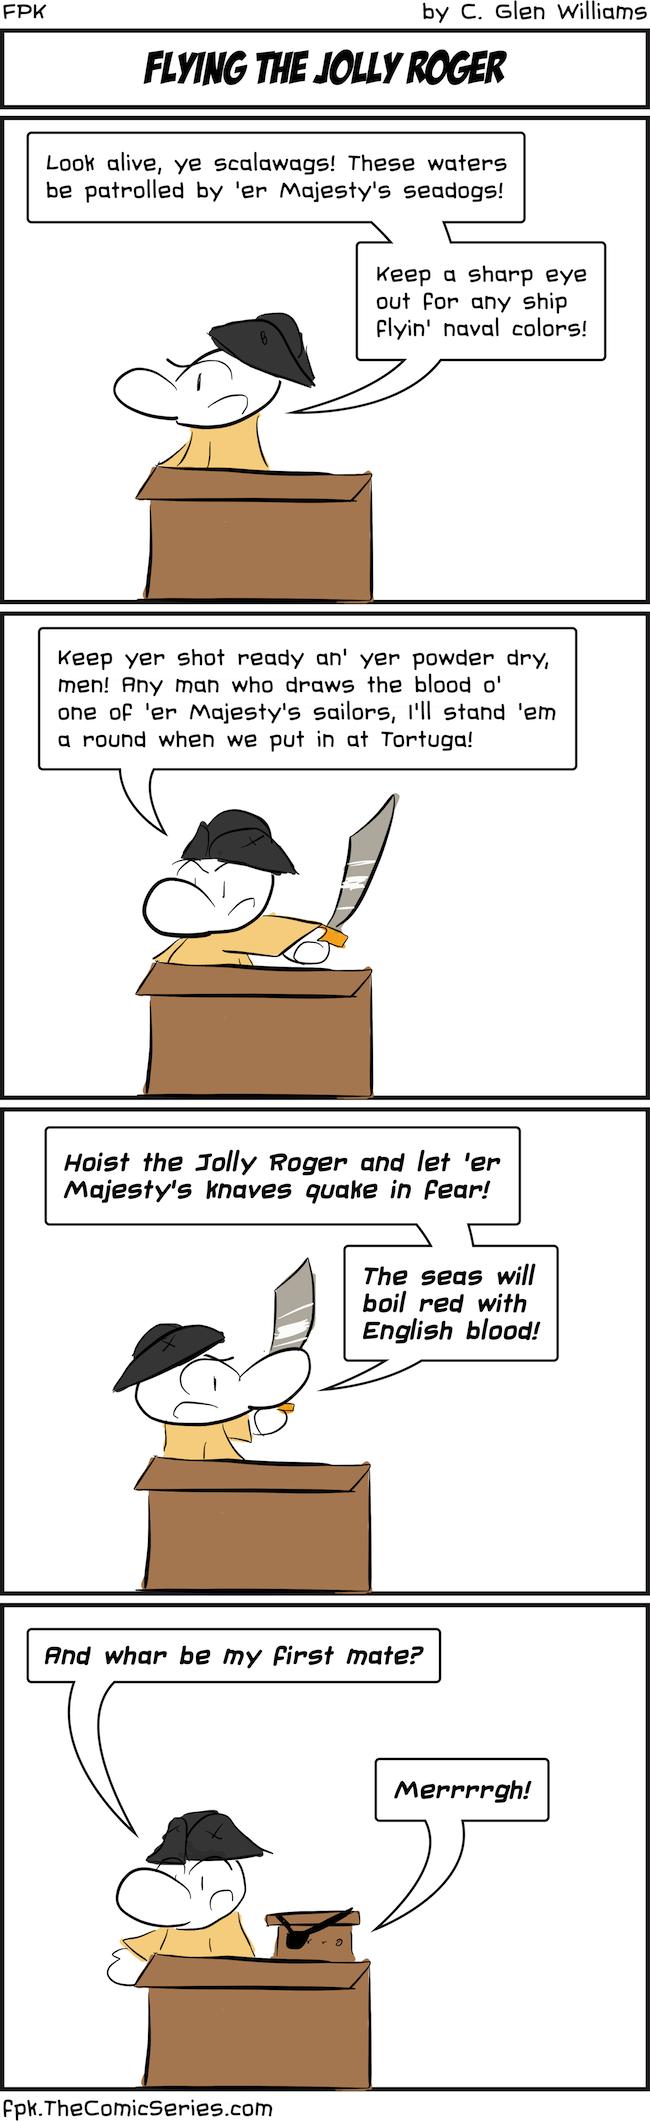 Flying the Jolly Roger